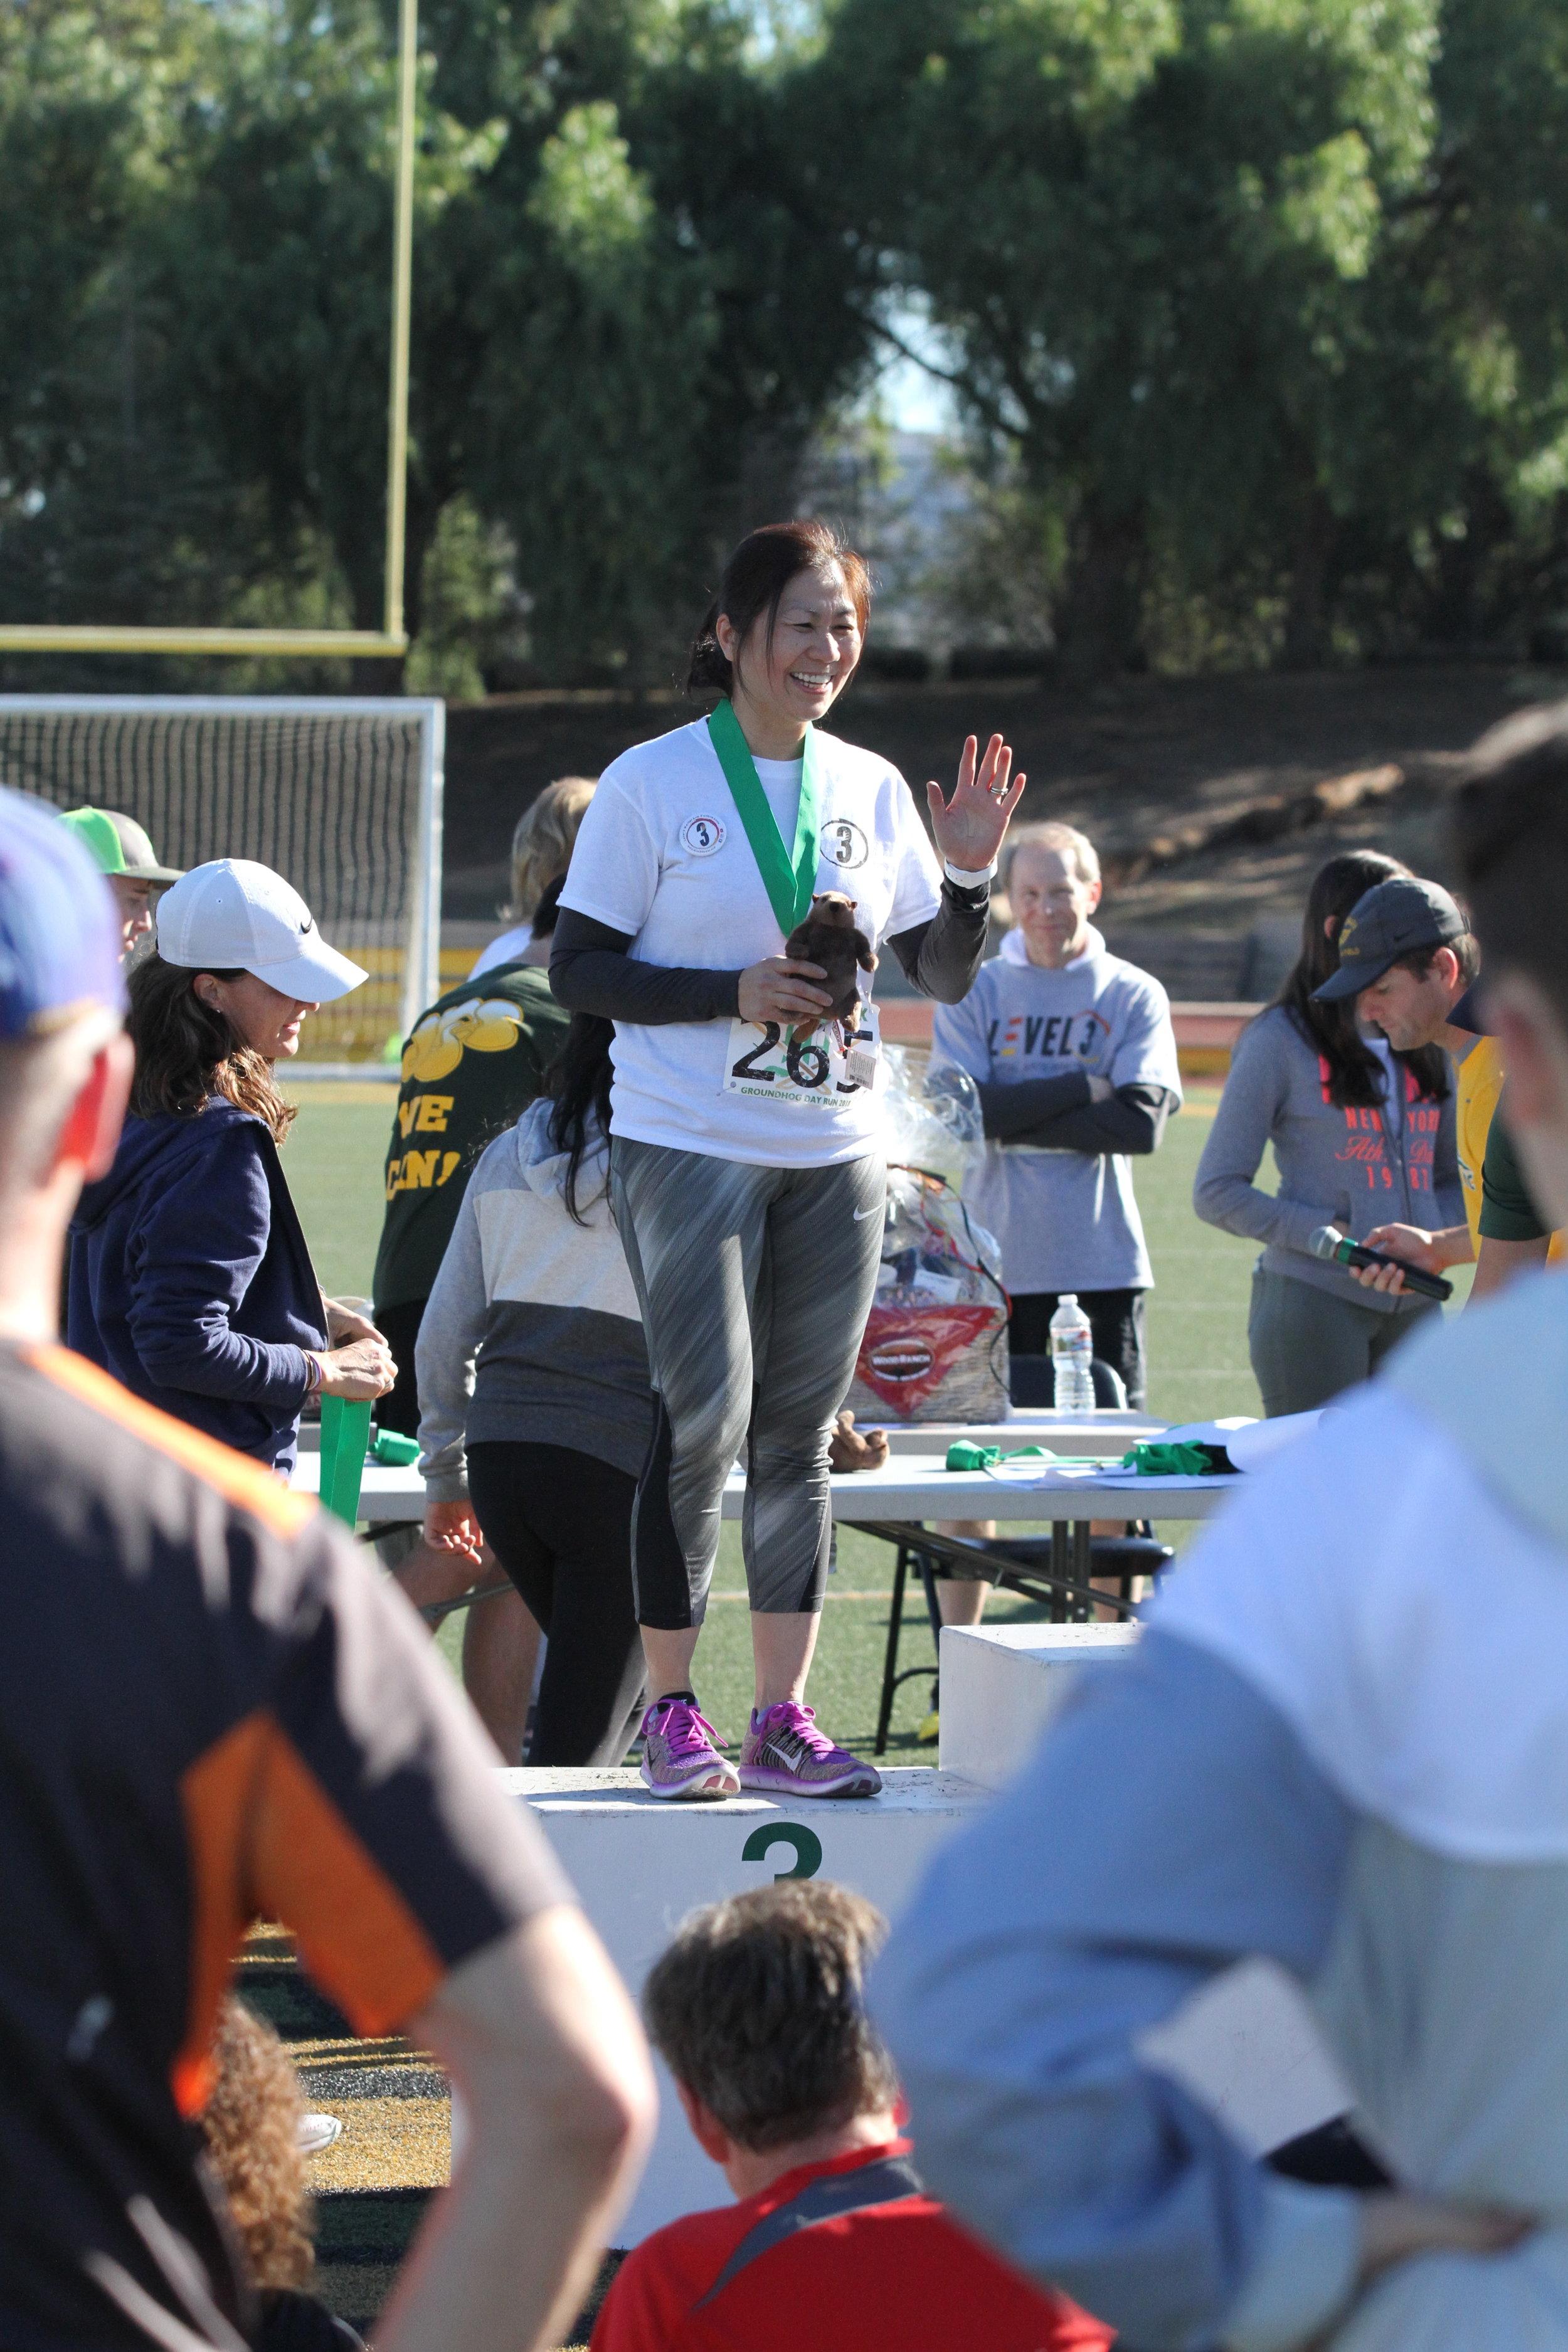 level 3 martial arts groundhog day run moorpark high school men women children adults families teens self defense classes